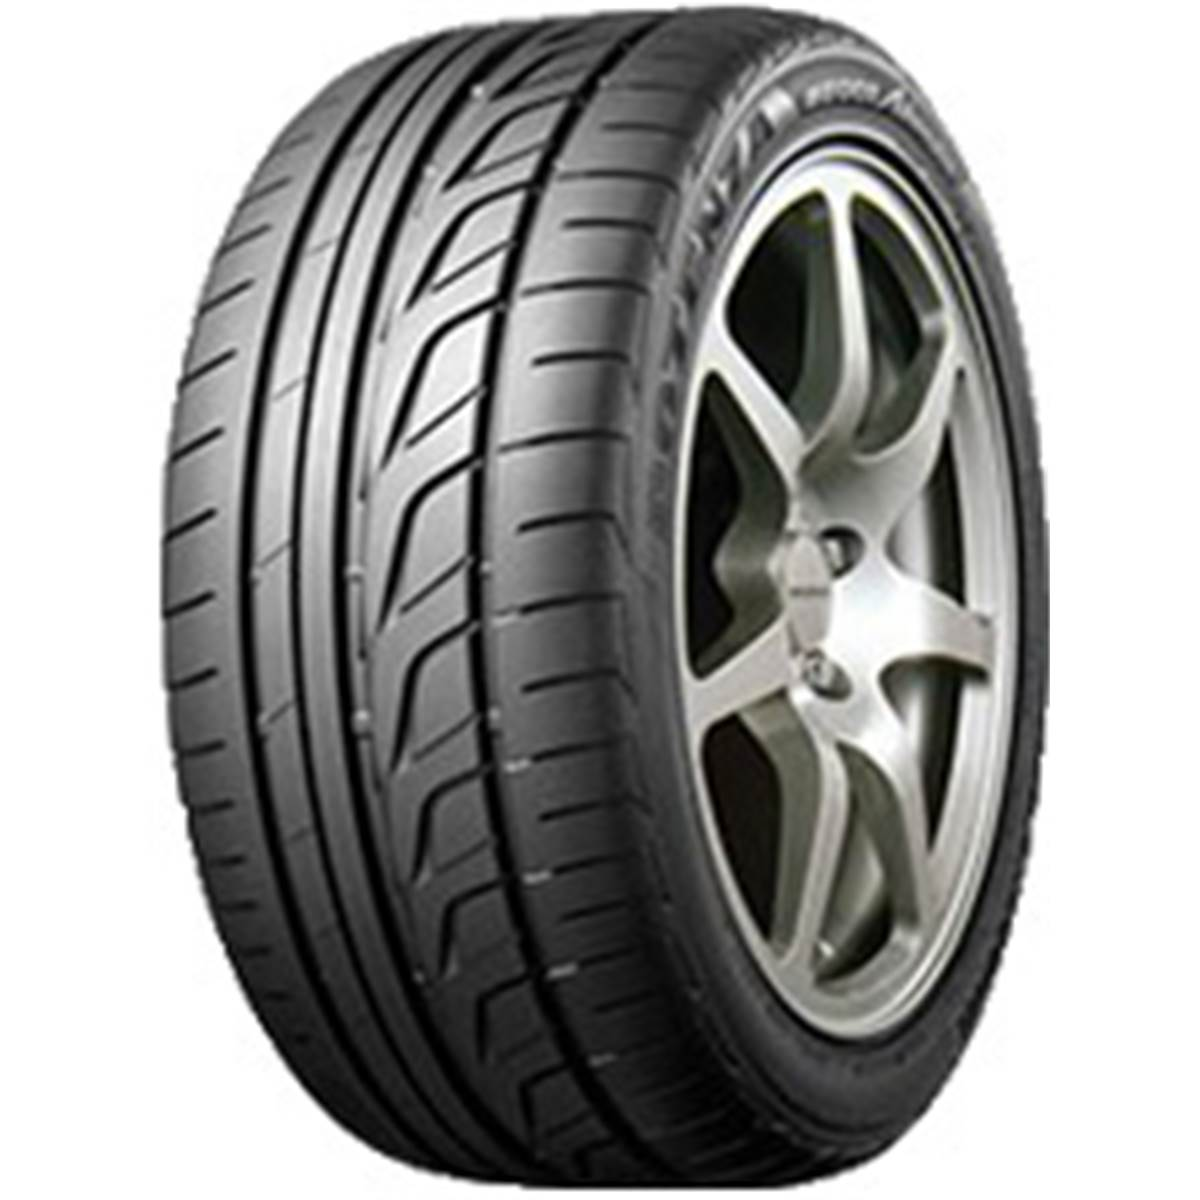 Pneu Bridgestone 205/55R15 88W Potenza Adrenalin Re002